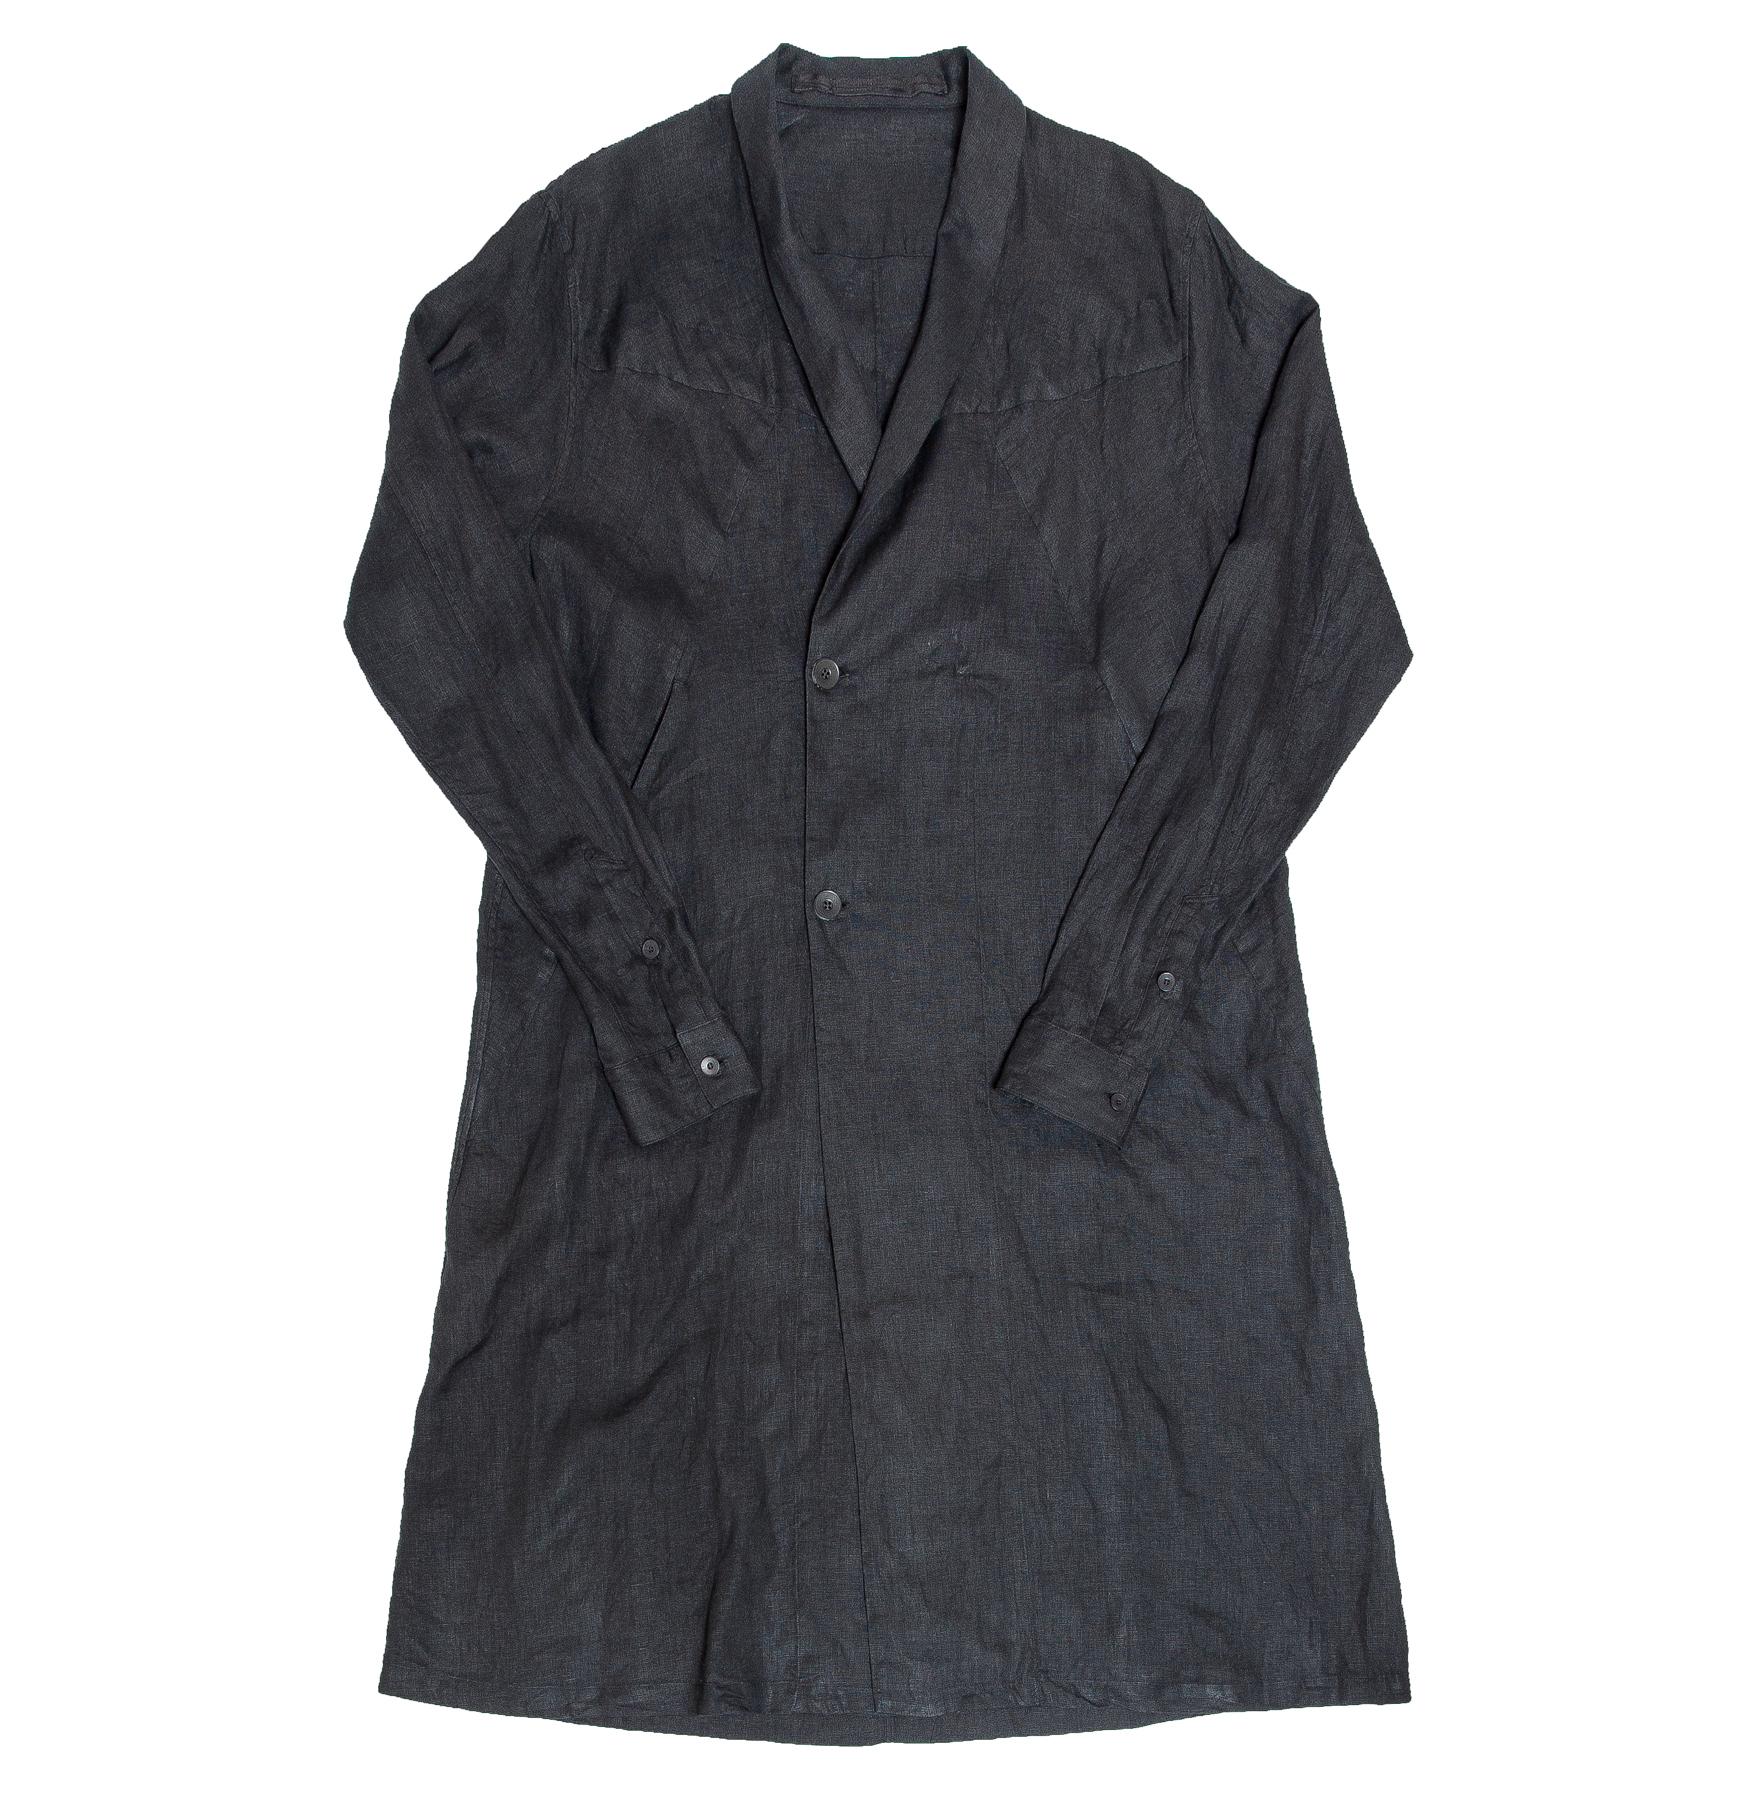 007COM3-BLACK / ガウンシャツ